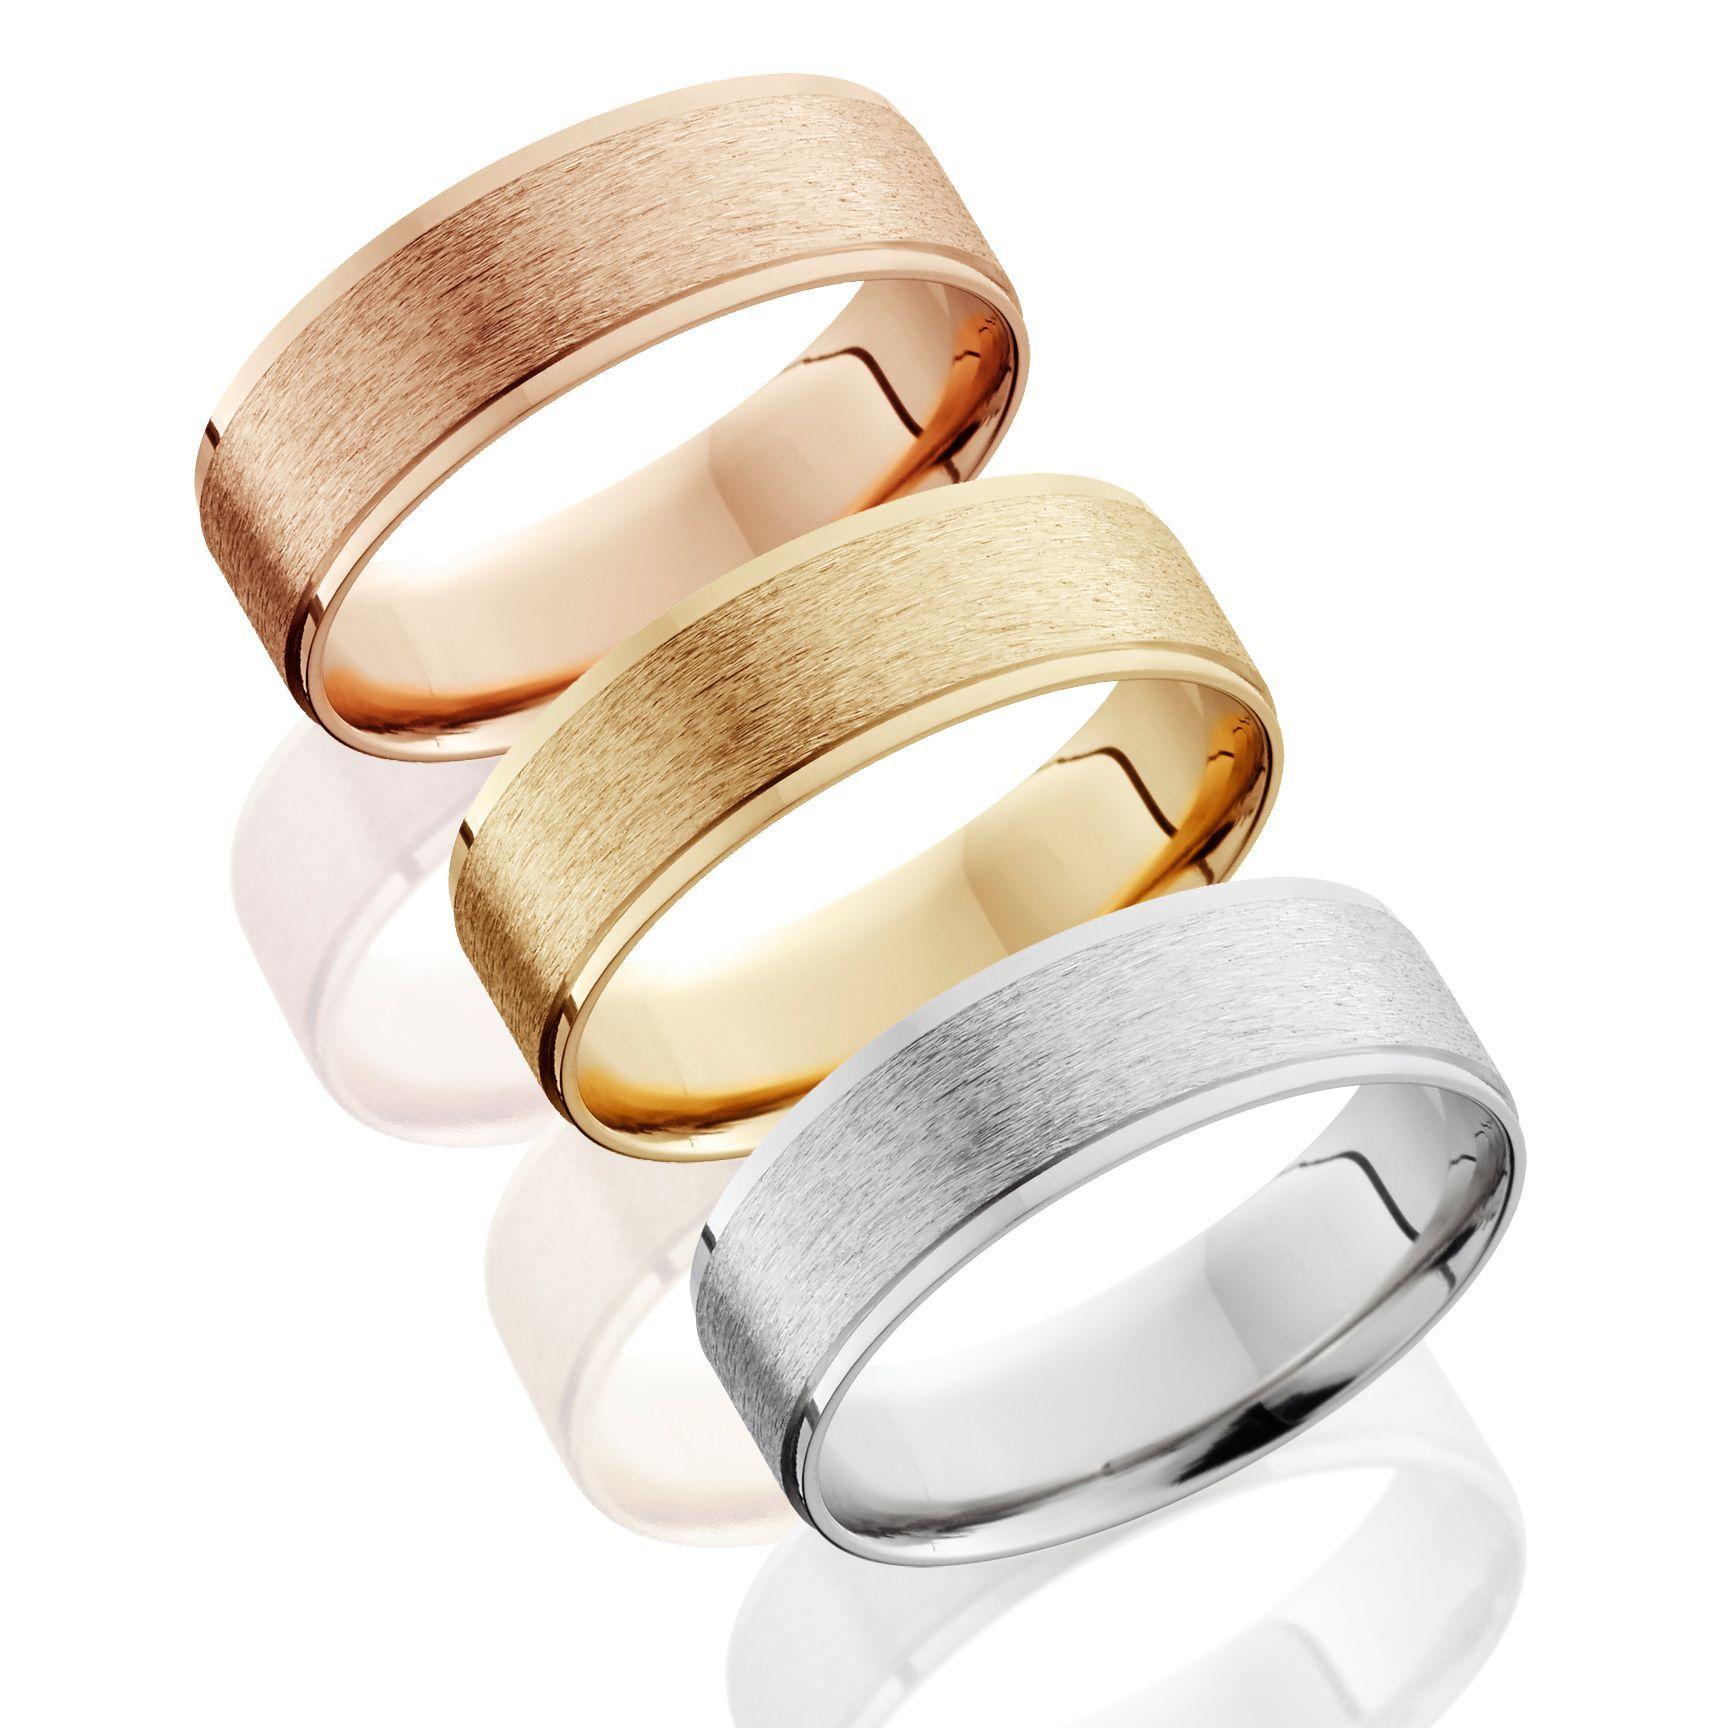 Bliss 14k Gold Mens 6mm Brushed Wedding Band Rose Size 12